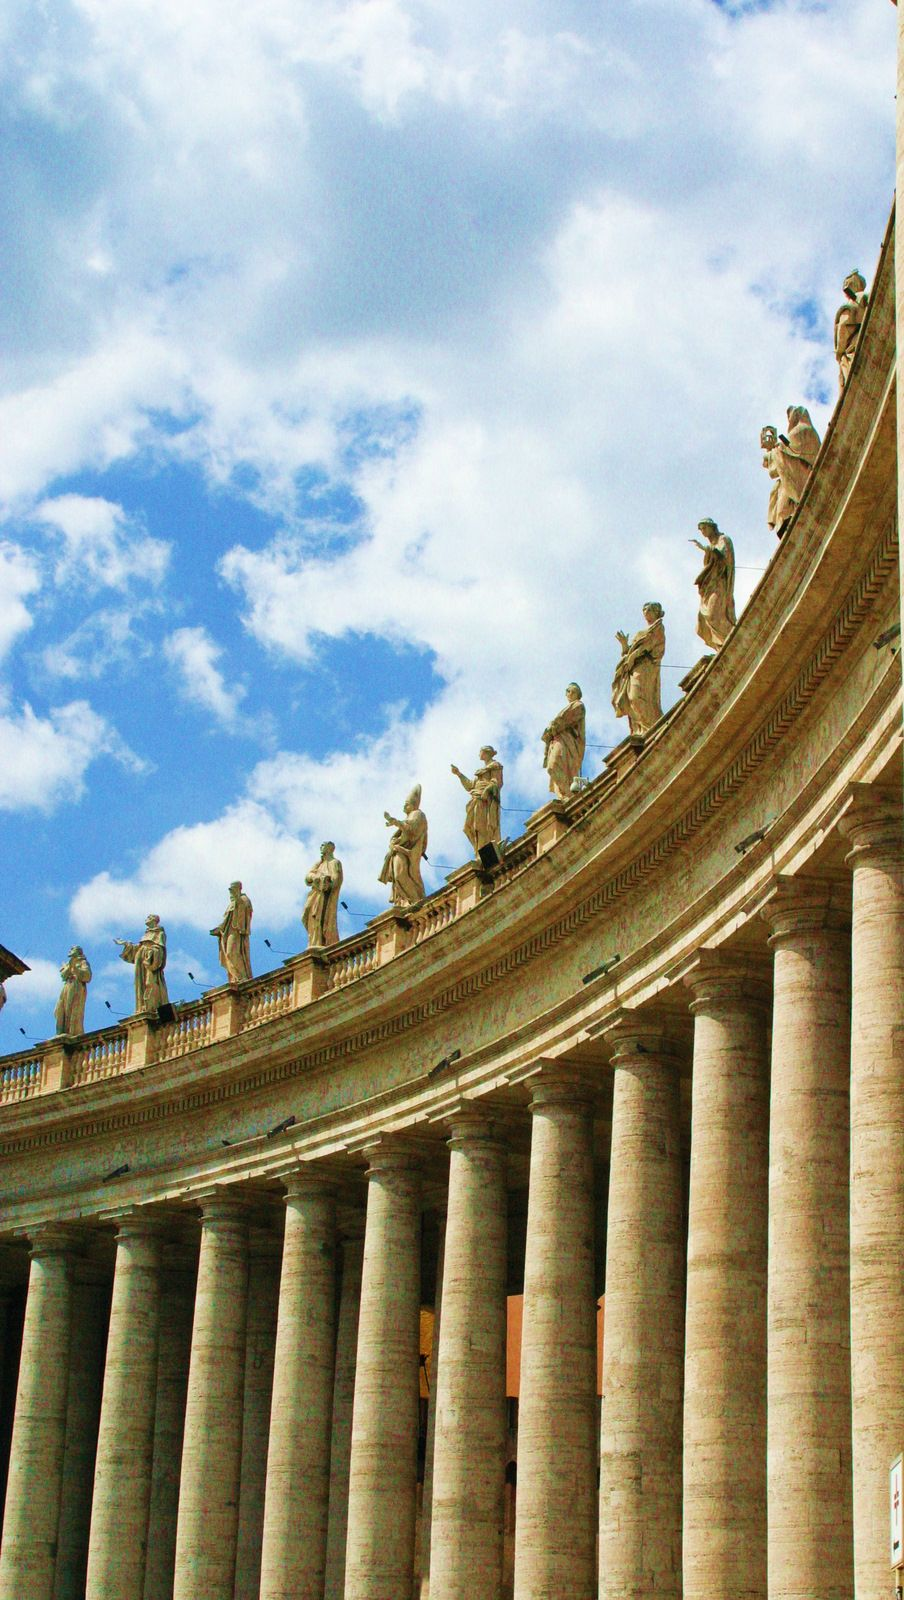 ~Vatican City, Rome, Italy